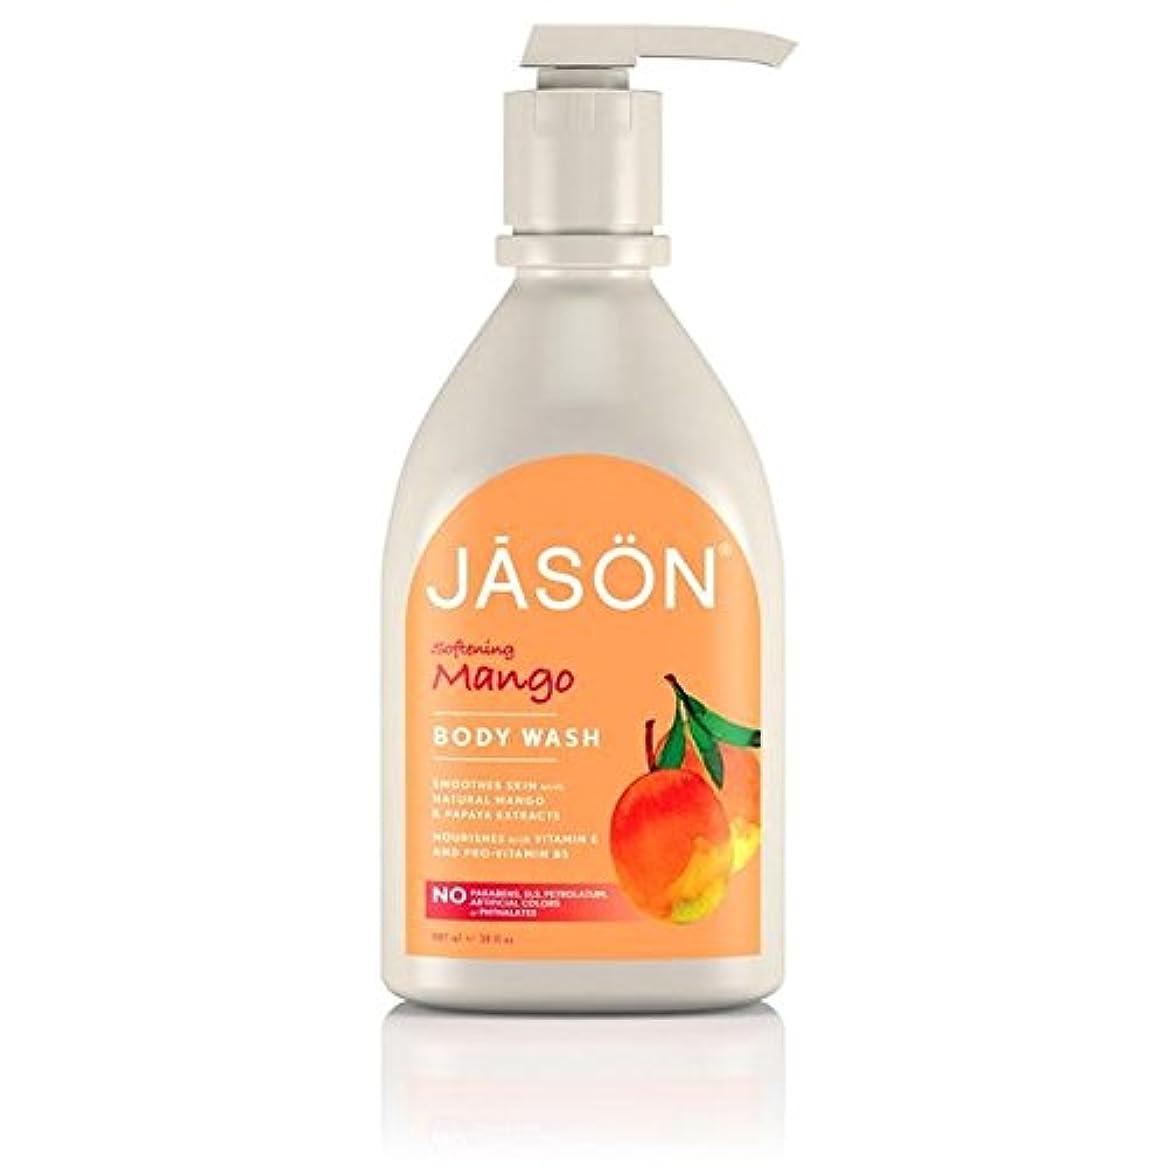 Jason Mango Satin Body Wash Pump 900ml (Pack of 6) - ジェイソン?マンゴーサテンボディウォッシュポンプ900ミリリットル x6 [並行輸入品]